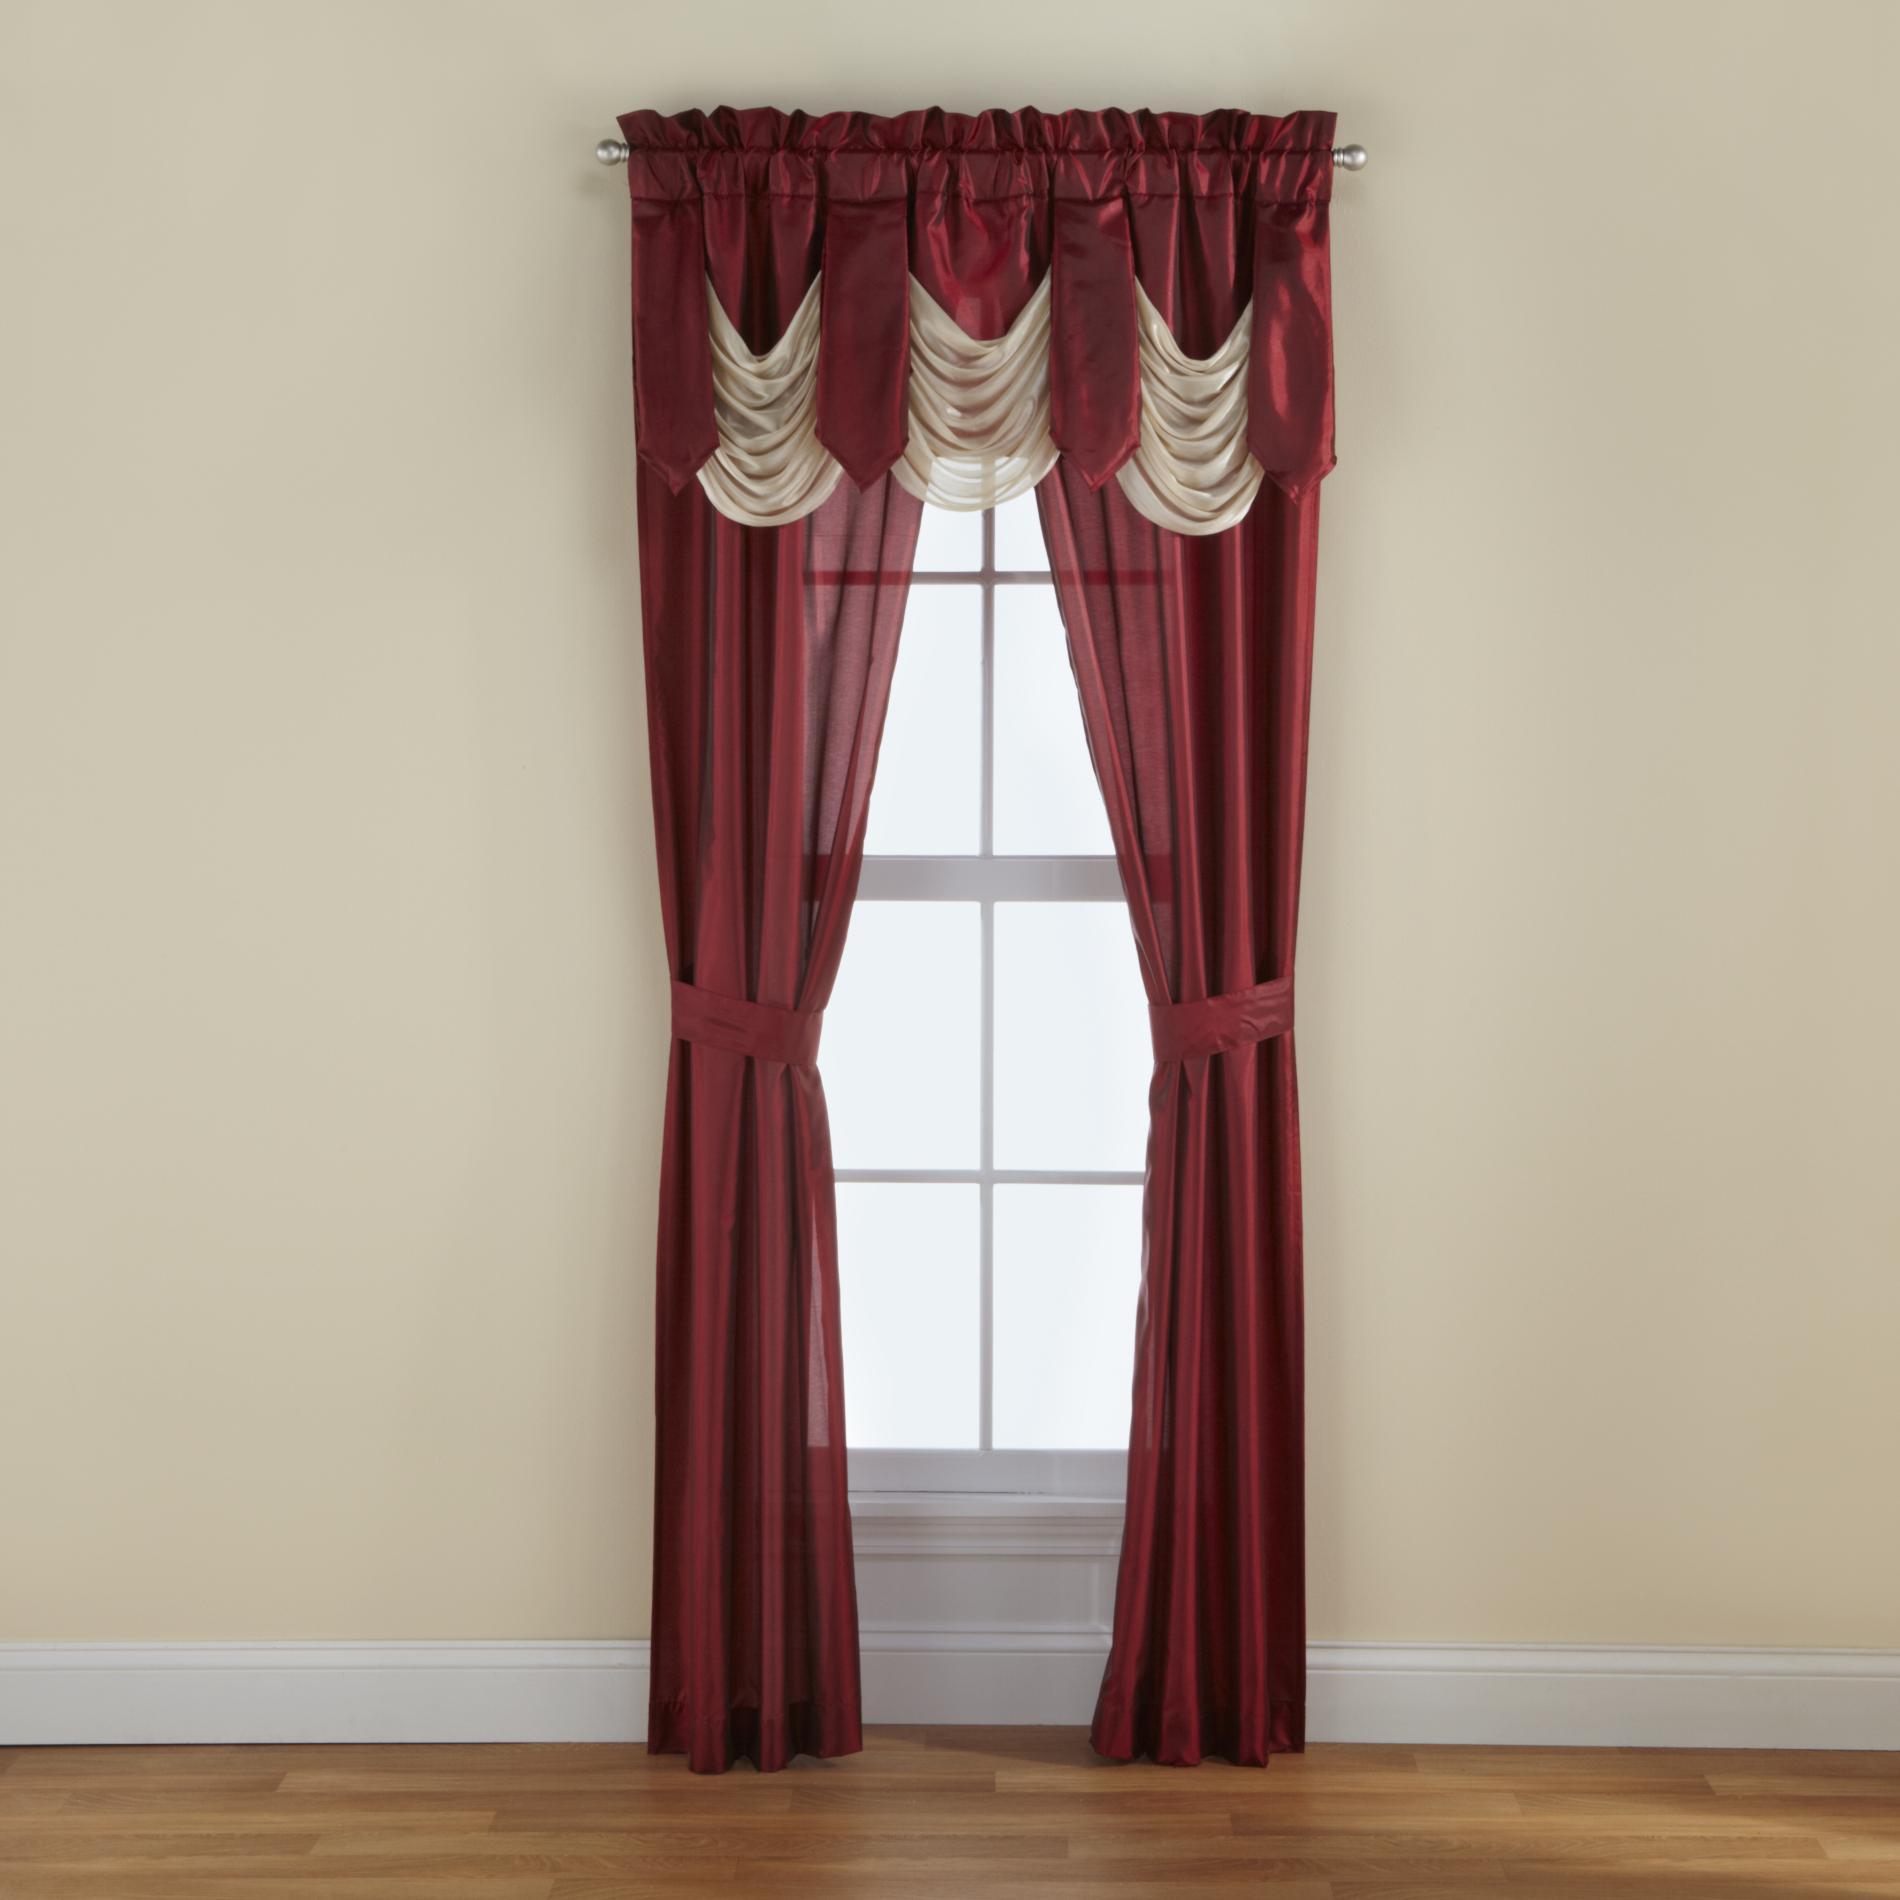 Cannon 5Piece Curtain Panels Valance  Tiebacks